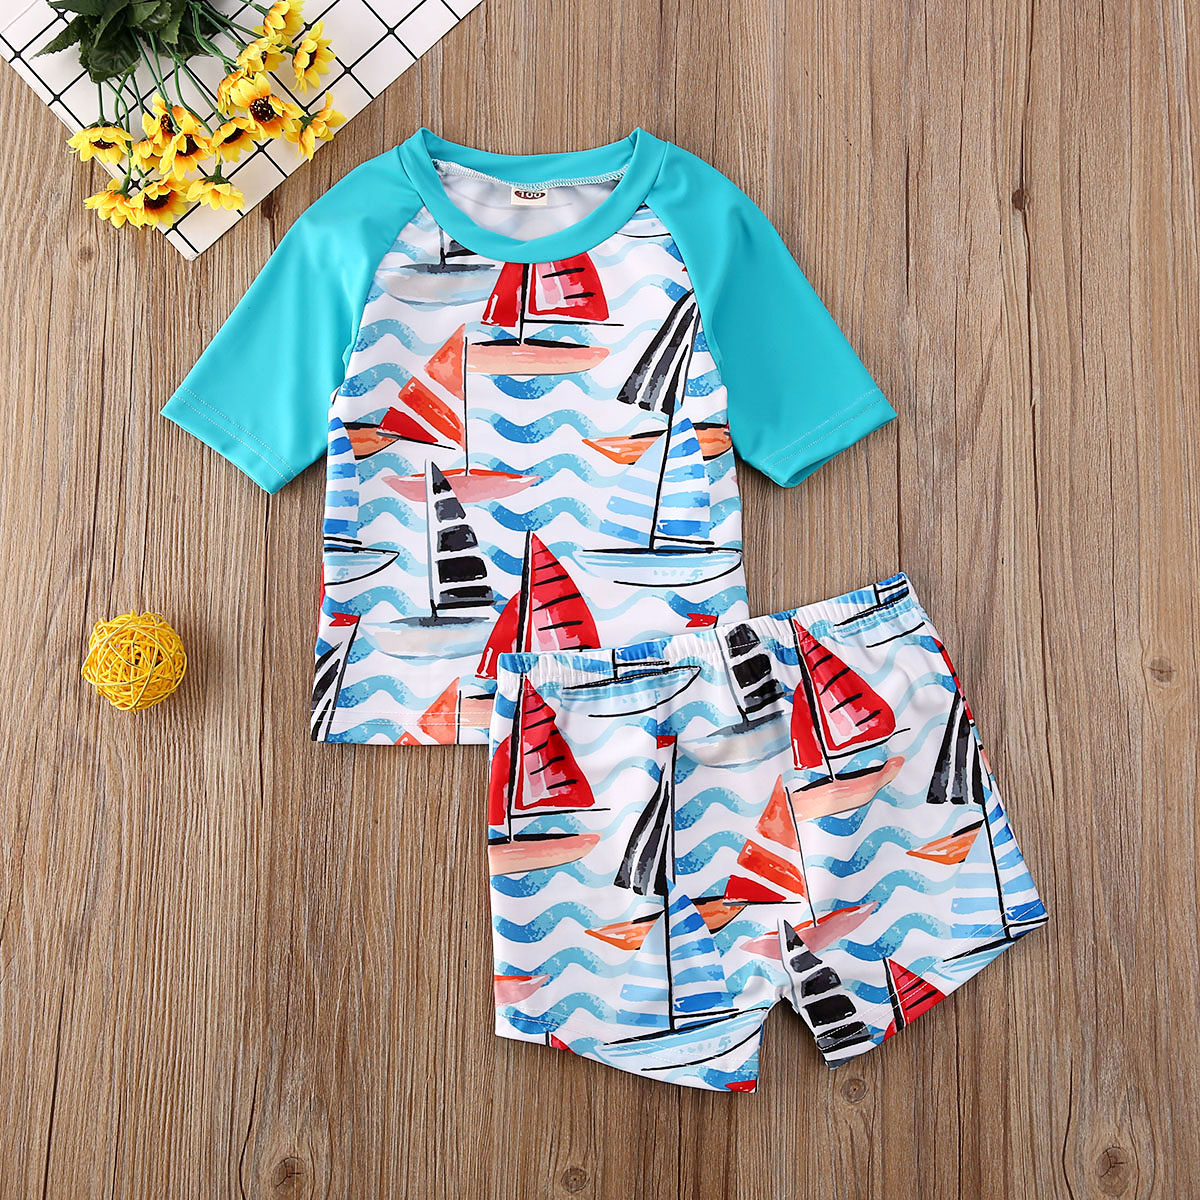 2pcs Toddler Baby Boy Kids Swimsuit Bathing Tankini Bikini Set Swimwear Beachwear Boys Swimming Suit Summer Children Swimwear